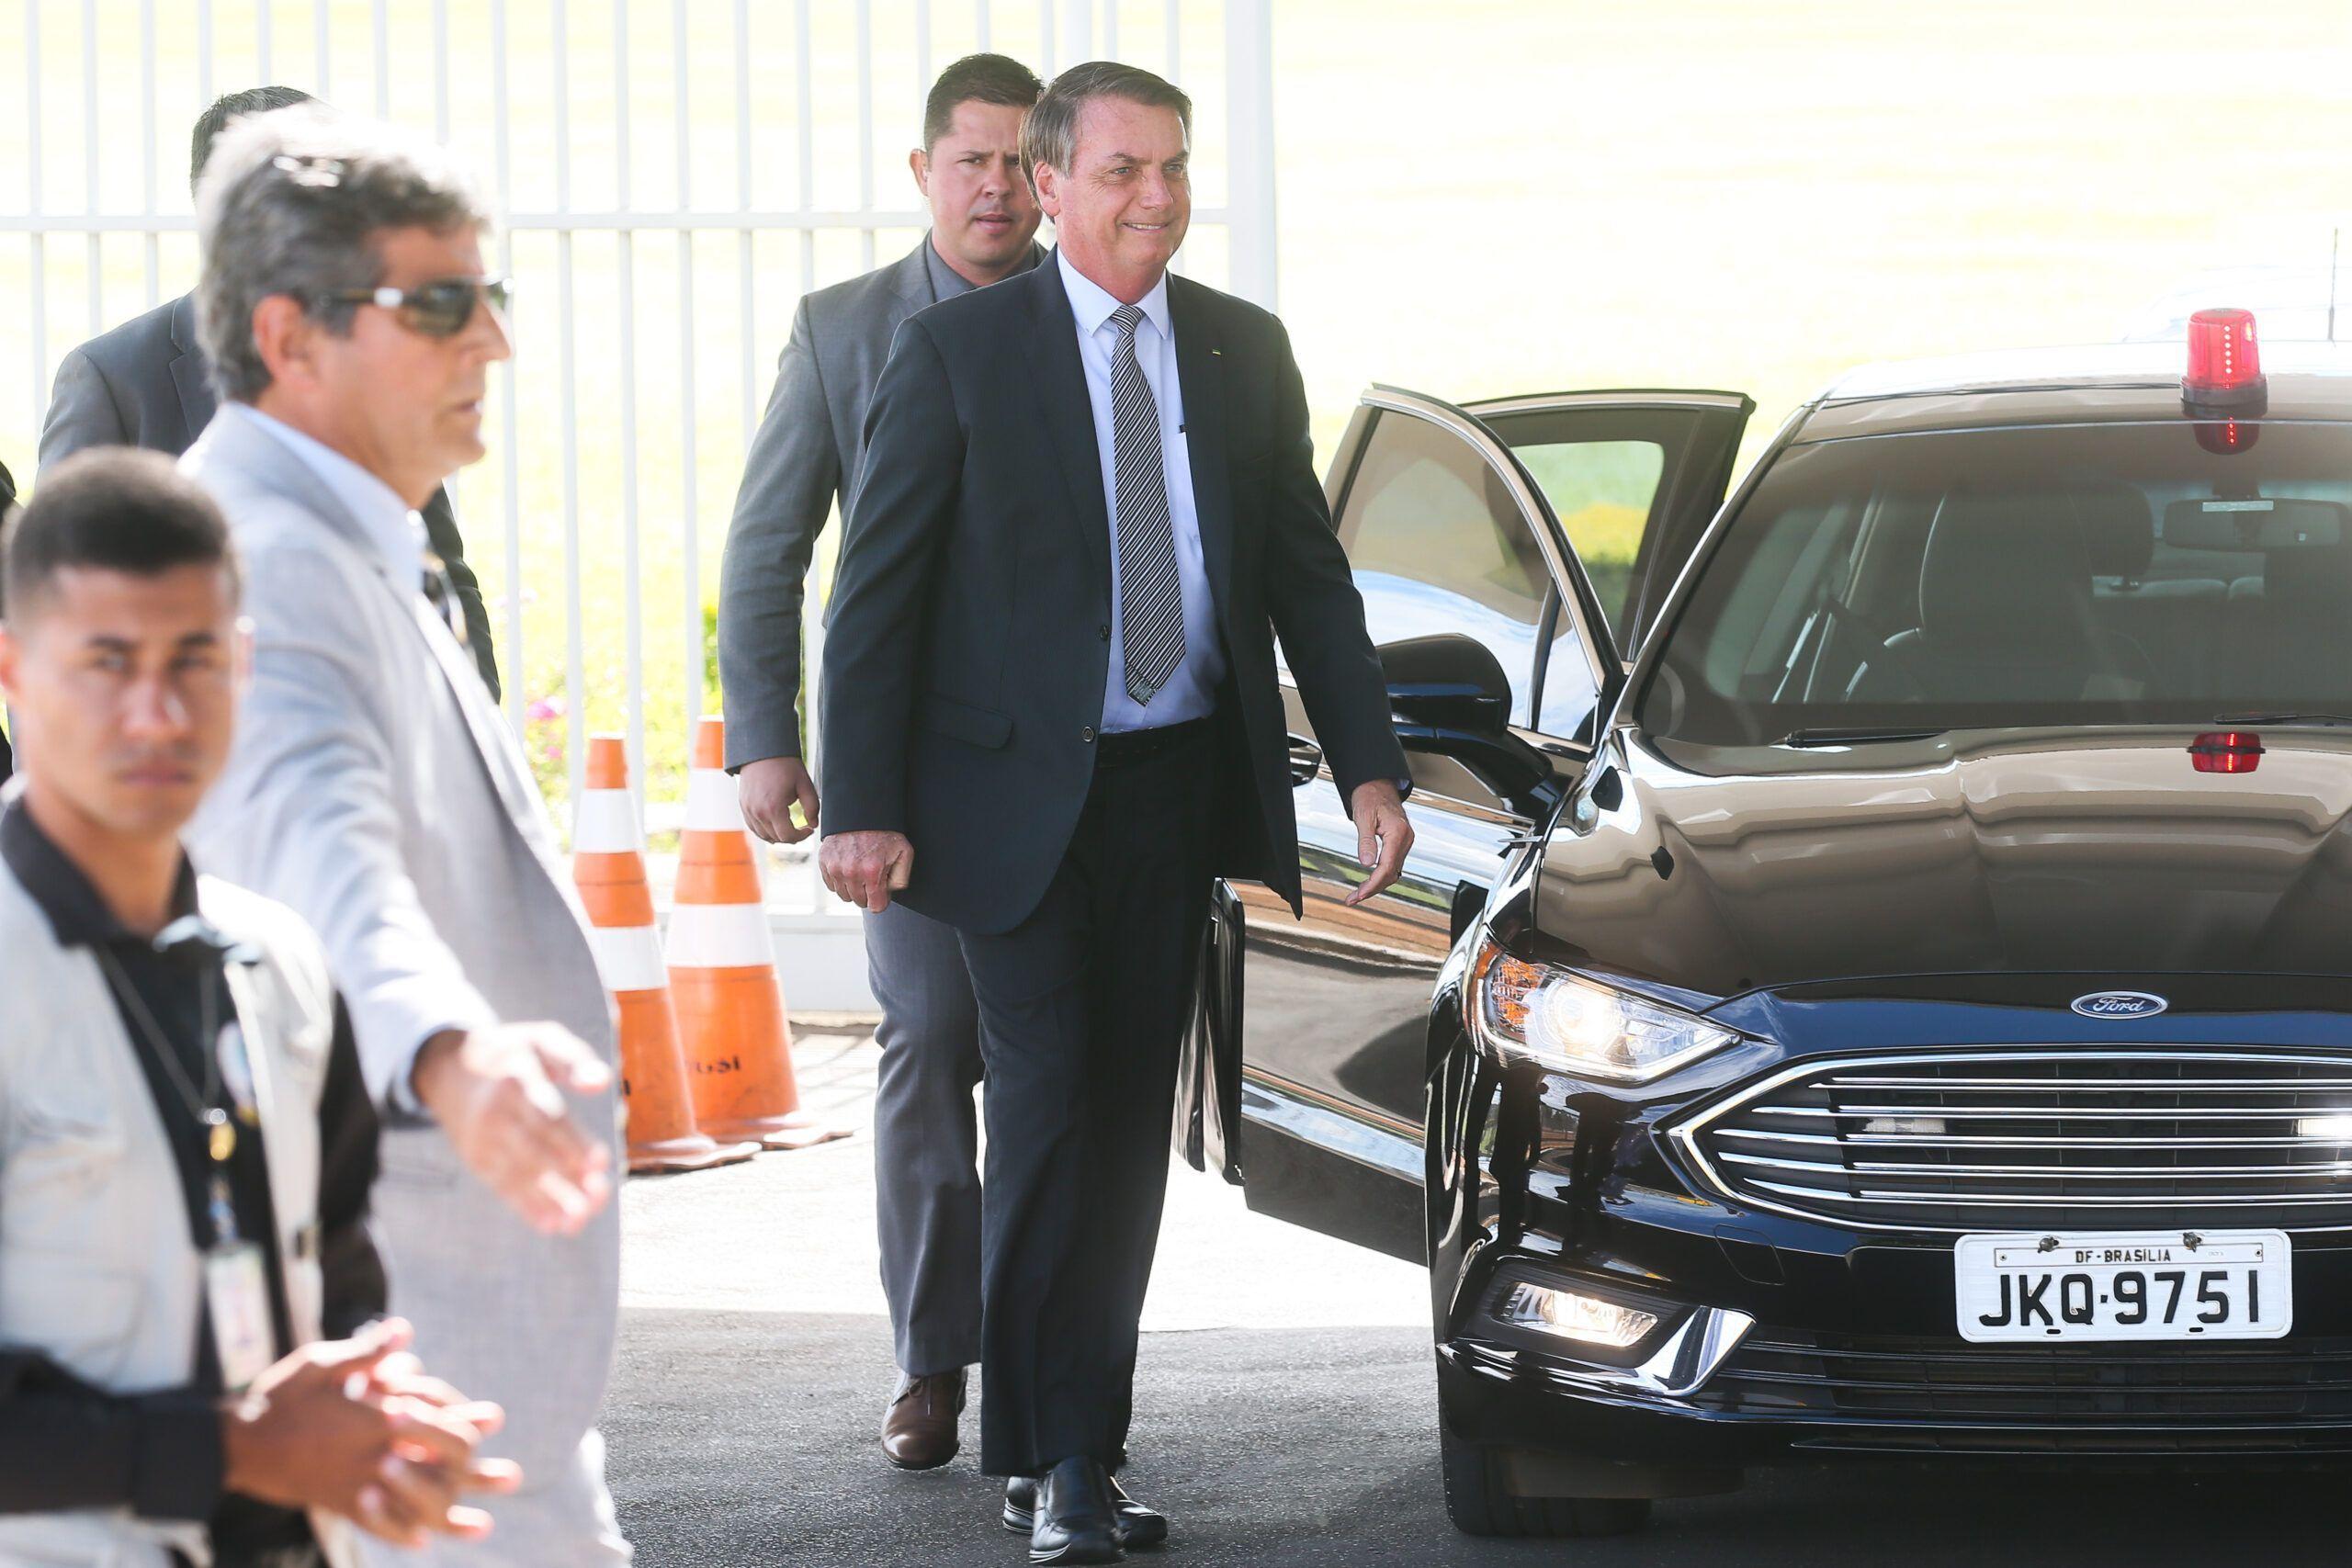 Pedido de impeachment contra Bolsonaro é protocolado